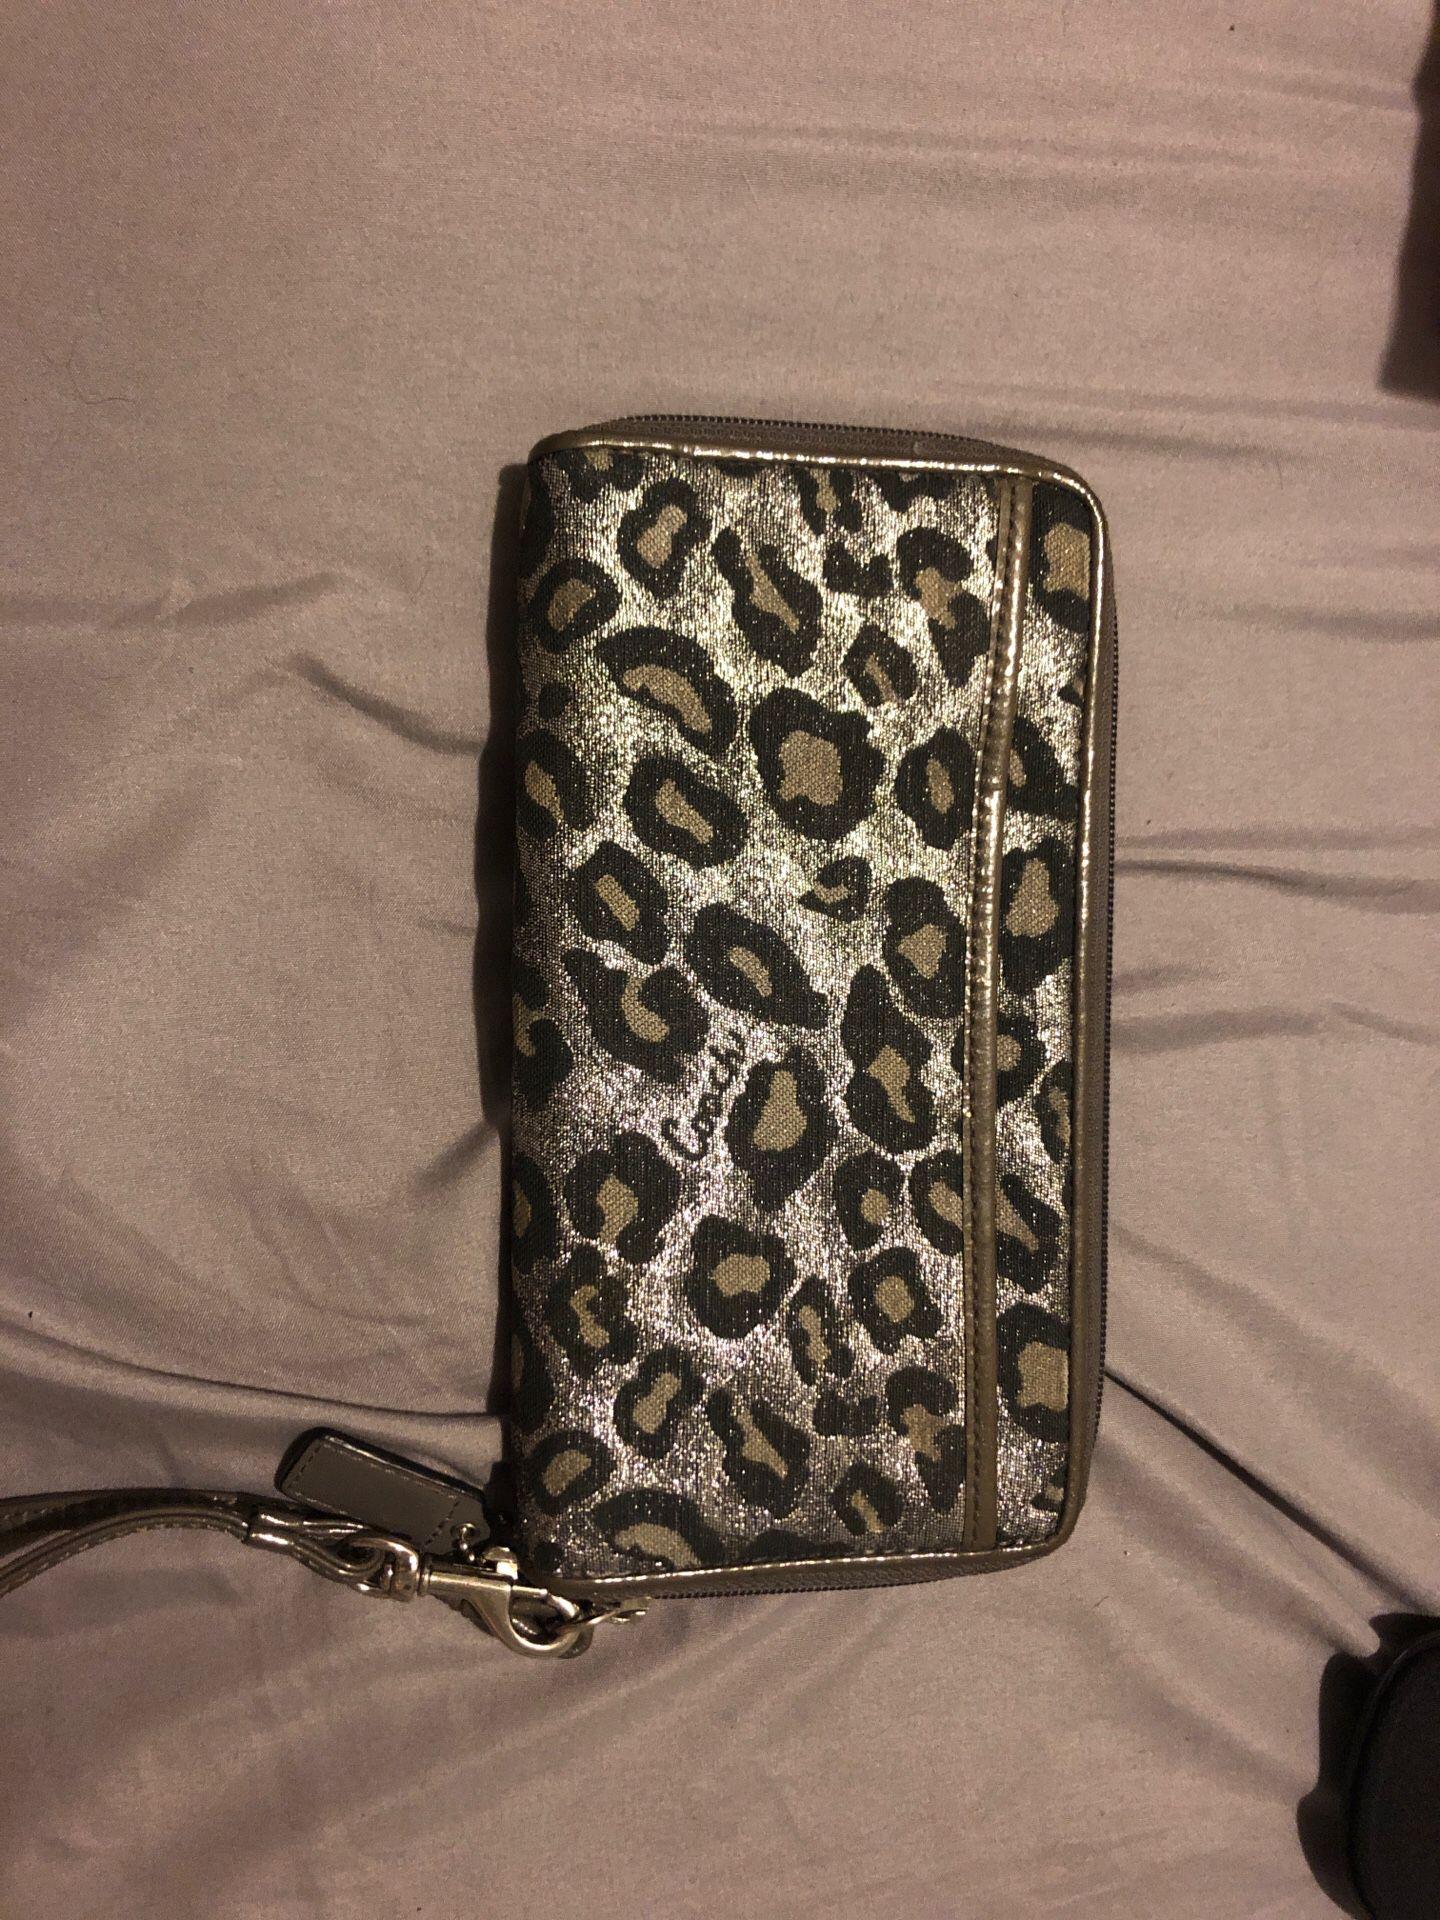 Coach pocket book purse